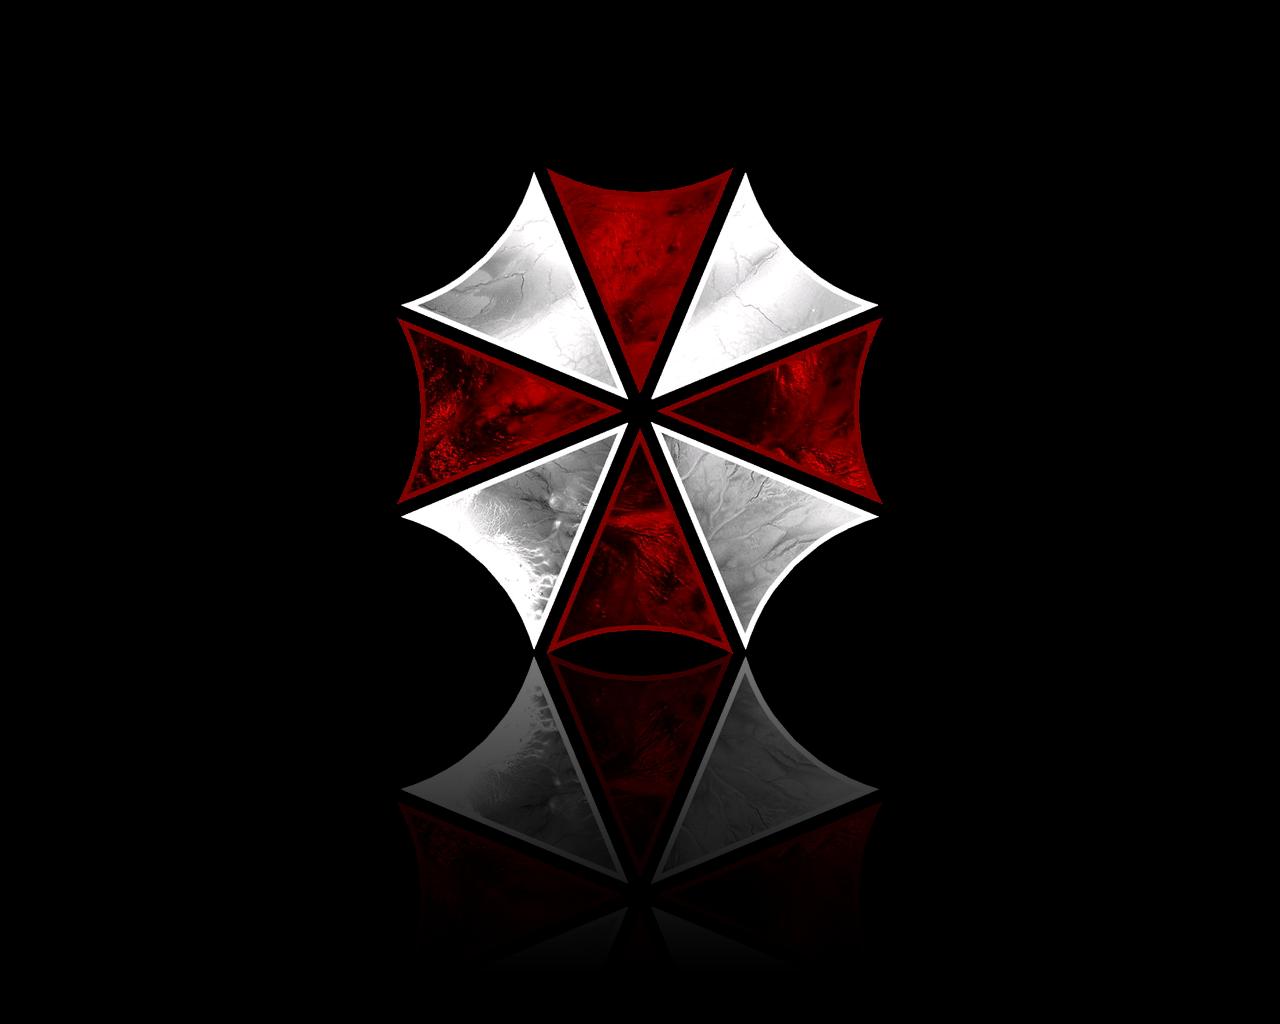 game-wallpapers-Album-on-Imgur-wallpaper-wp4802931